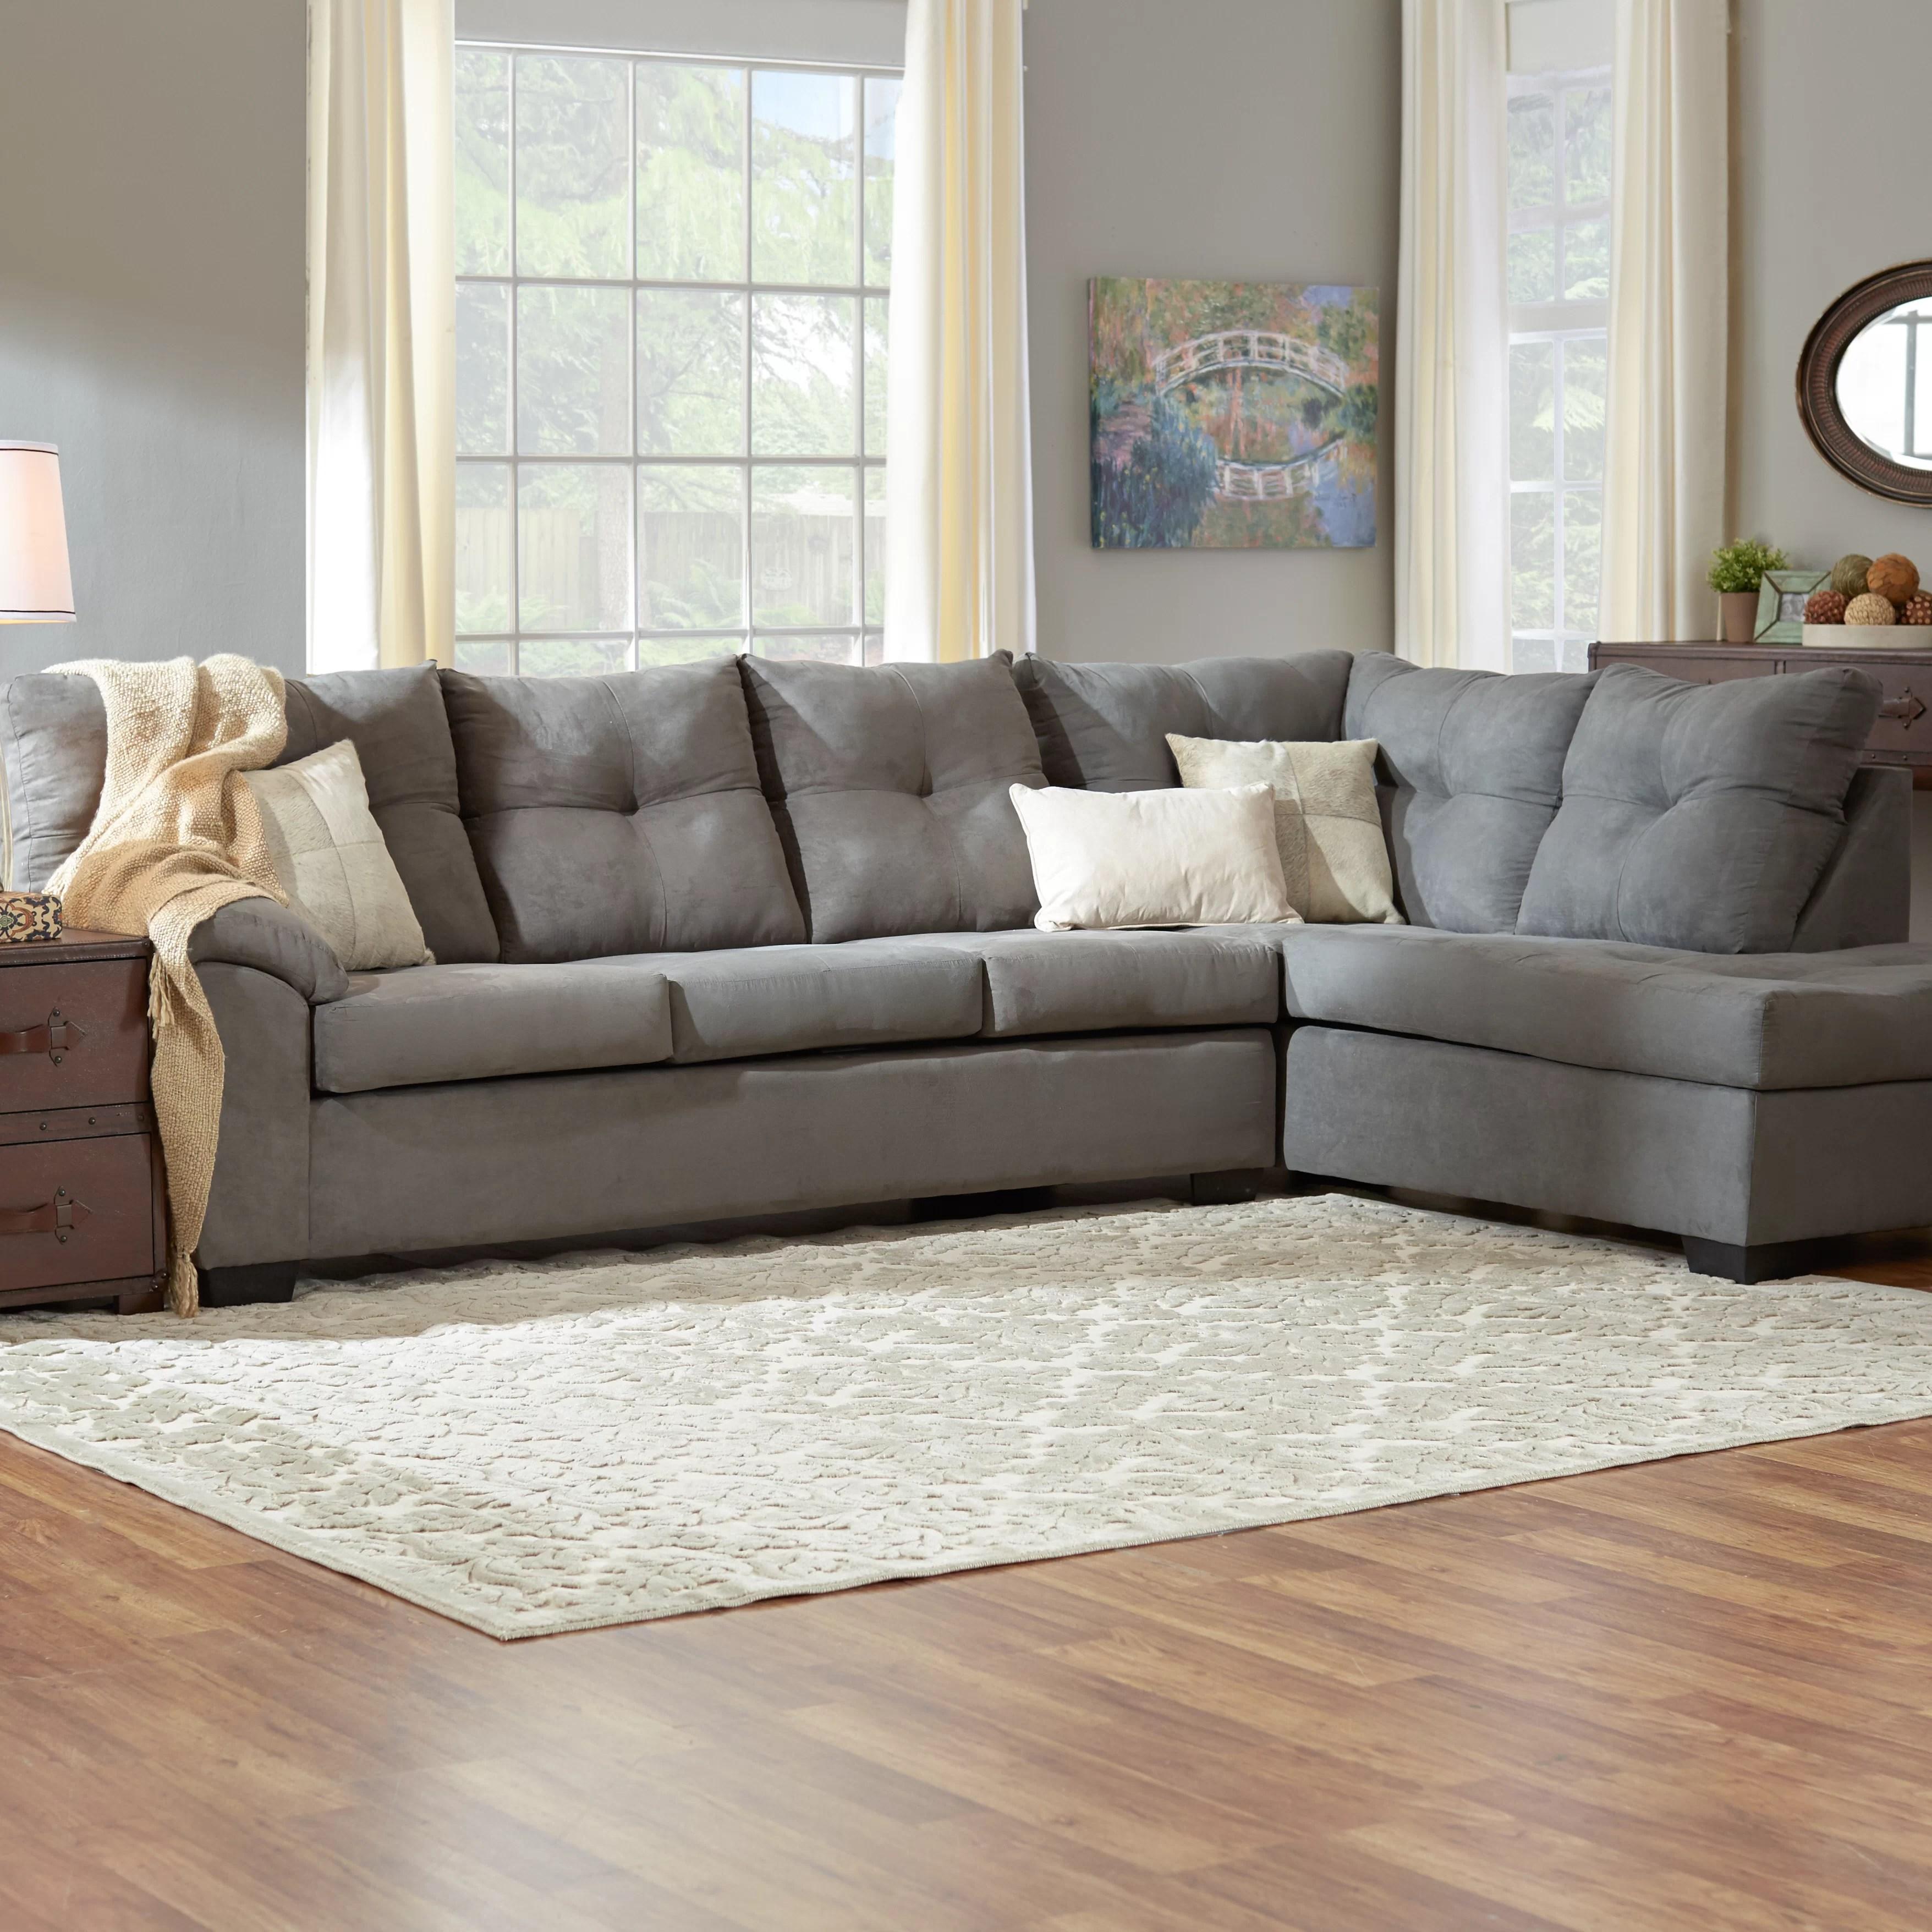 molinaro 122 right hand facing sofa chaise